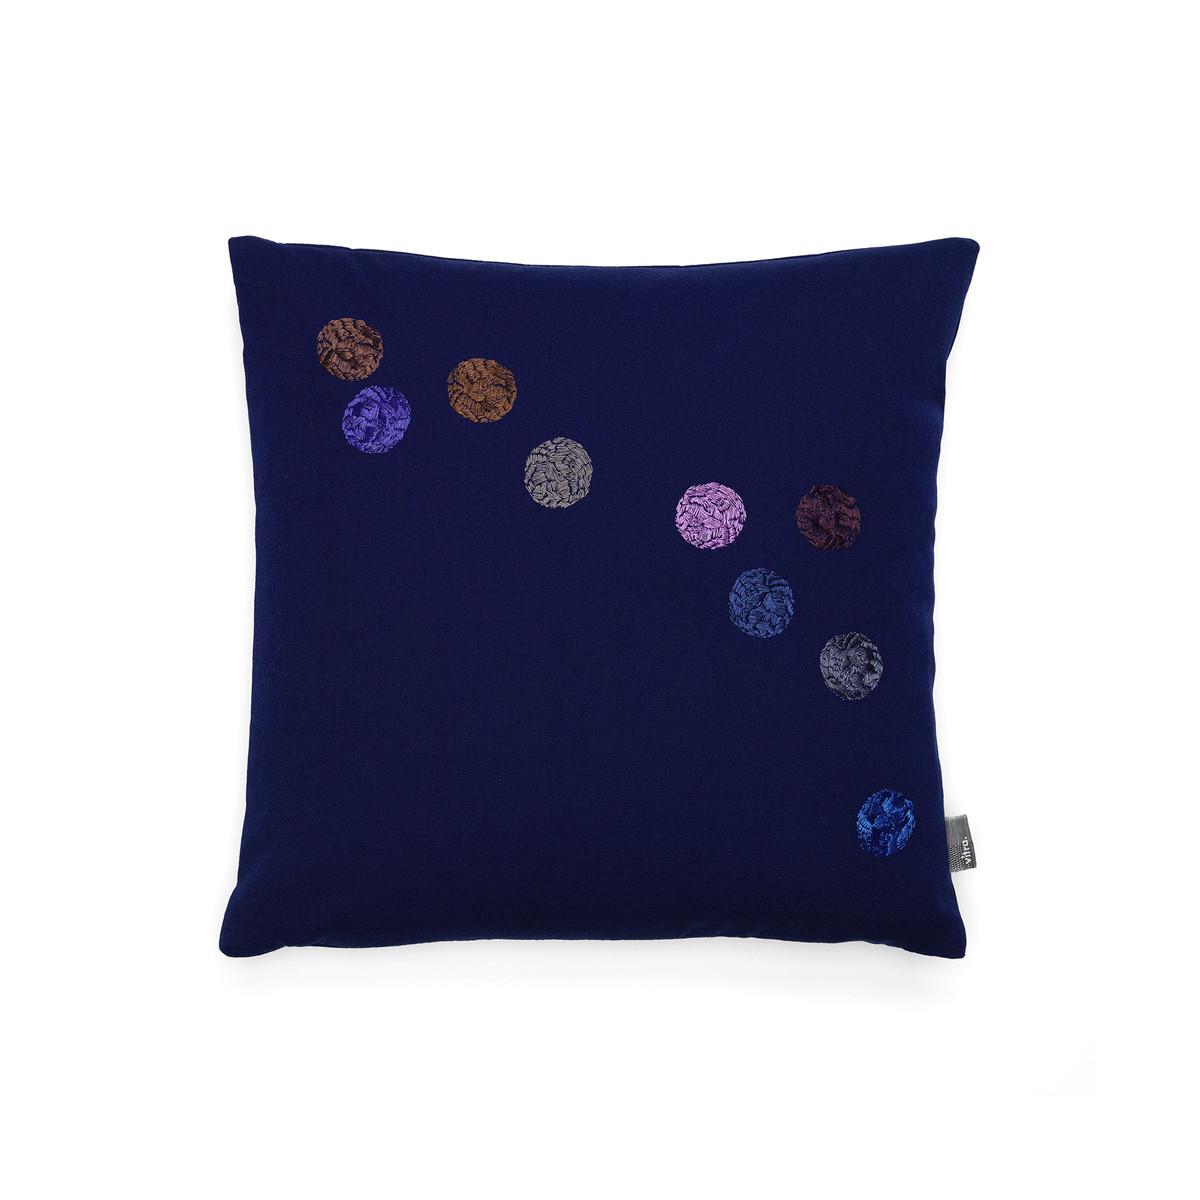 vitra dot kissen 40 x 40 cm tintenblau blau t 40 b 40 online kaufen bei woonio. Black Bedroom Furniture Sets. Home Design Ideas